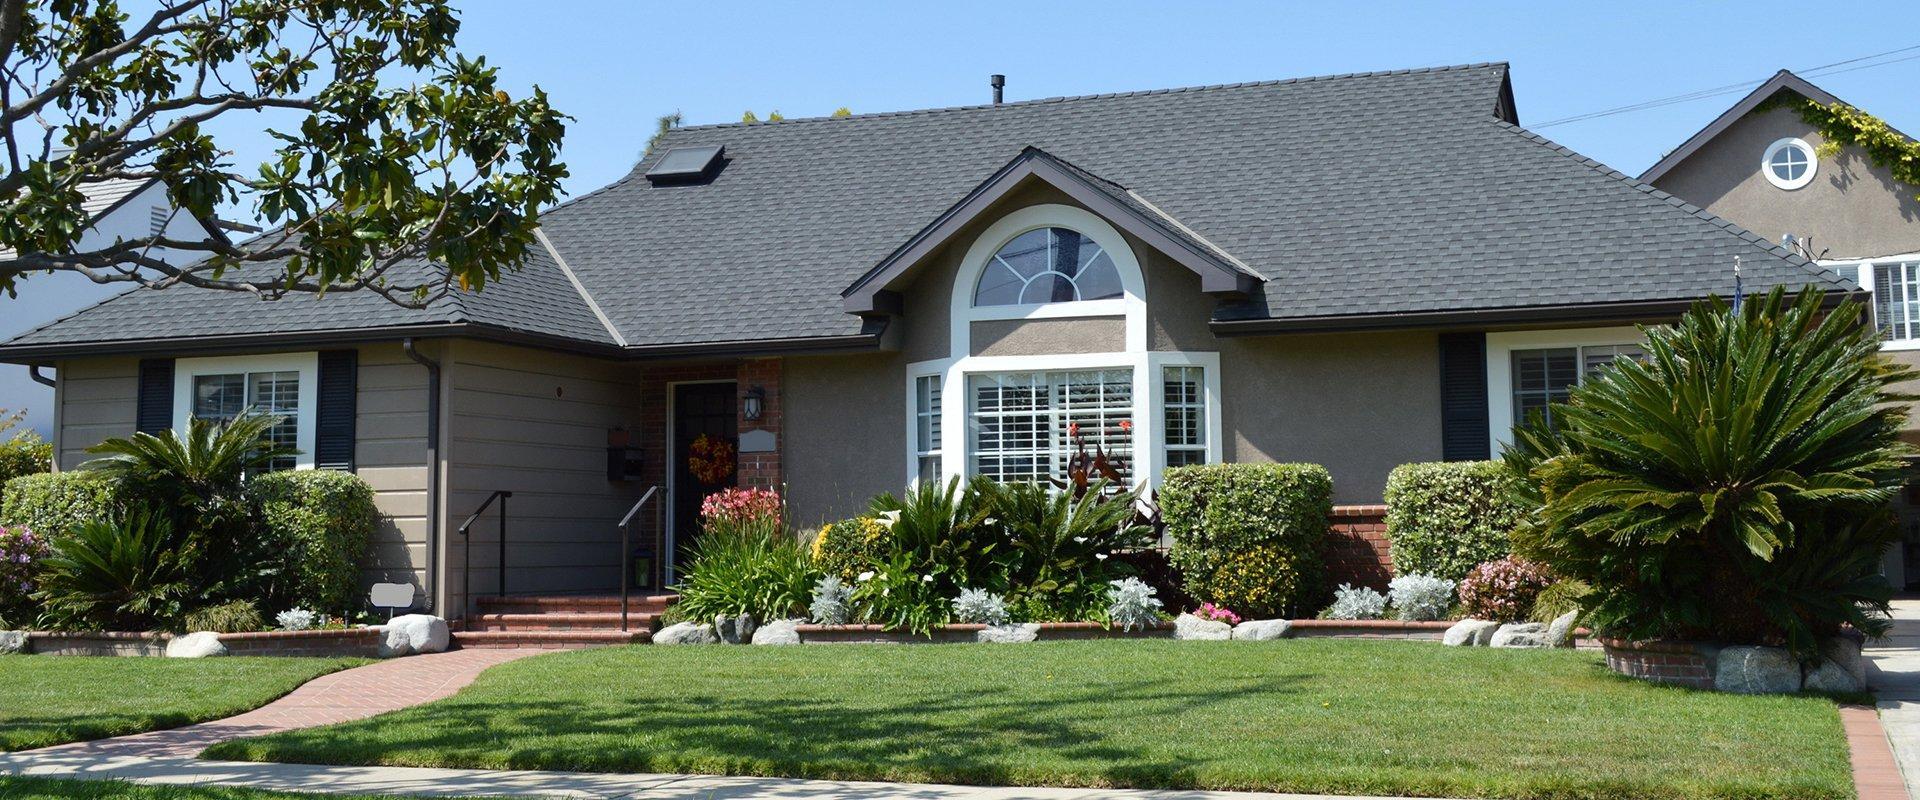 the exterior of a home in murrieta california